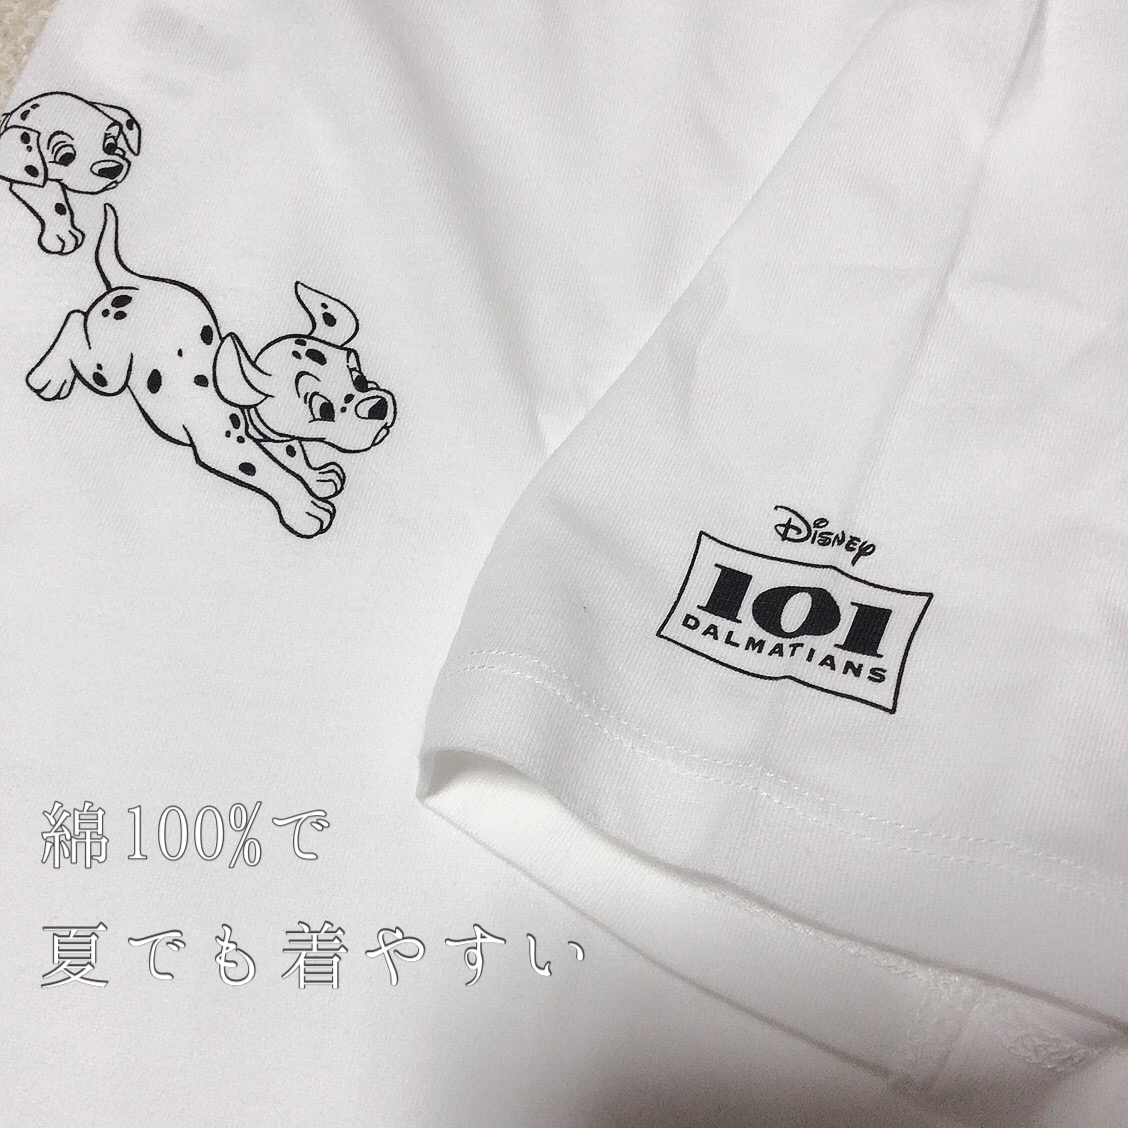 UNIQLO(ユニクロ) ディズニー ファーリー フレンズ UT グラフィックTシャツ 101匹わんちゃん(半袖・リラックスフィット)の良い点・メリットに関するkhさんの口コミ画像3